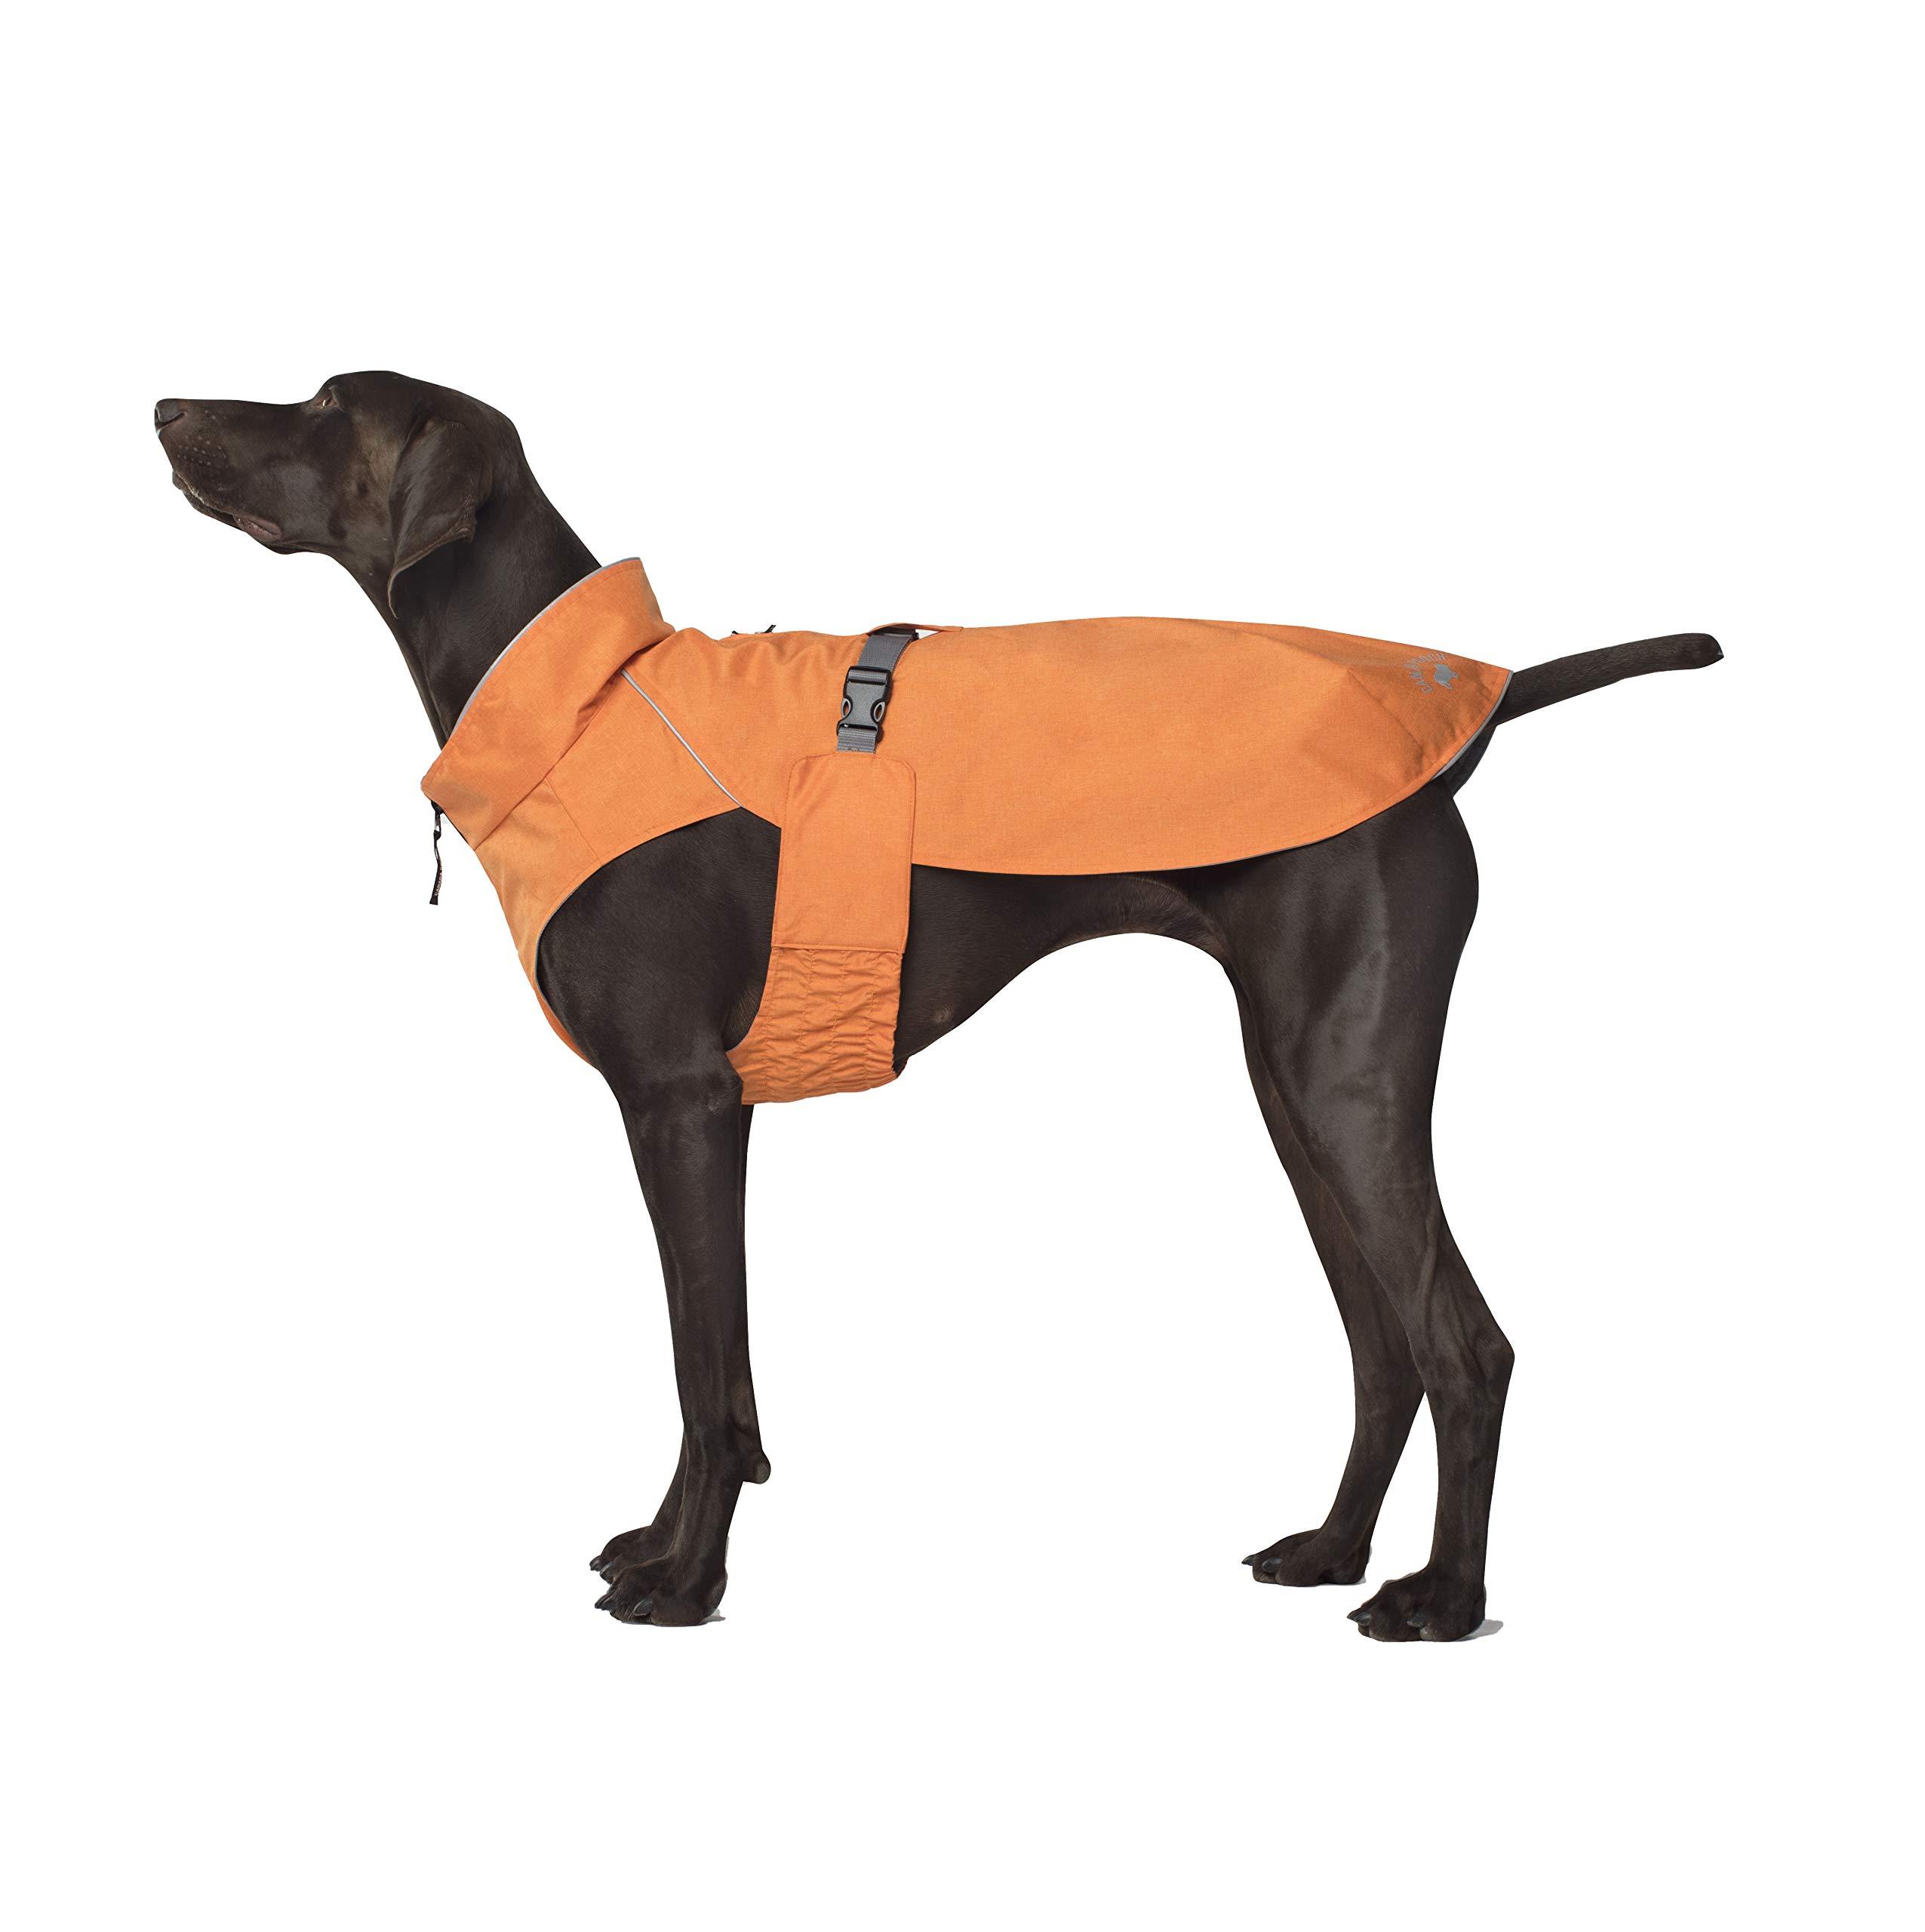 Canada Pooch The Expedition Raincoat, Orange, Size 24 by Canada Pooch